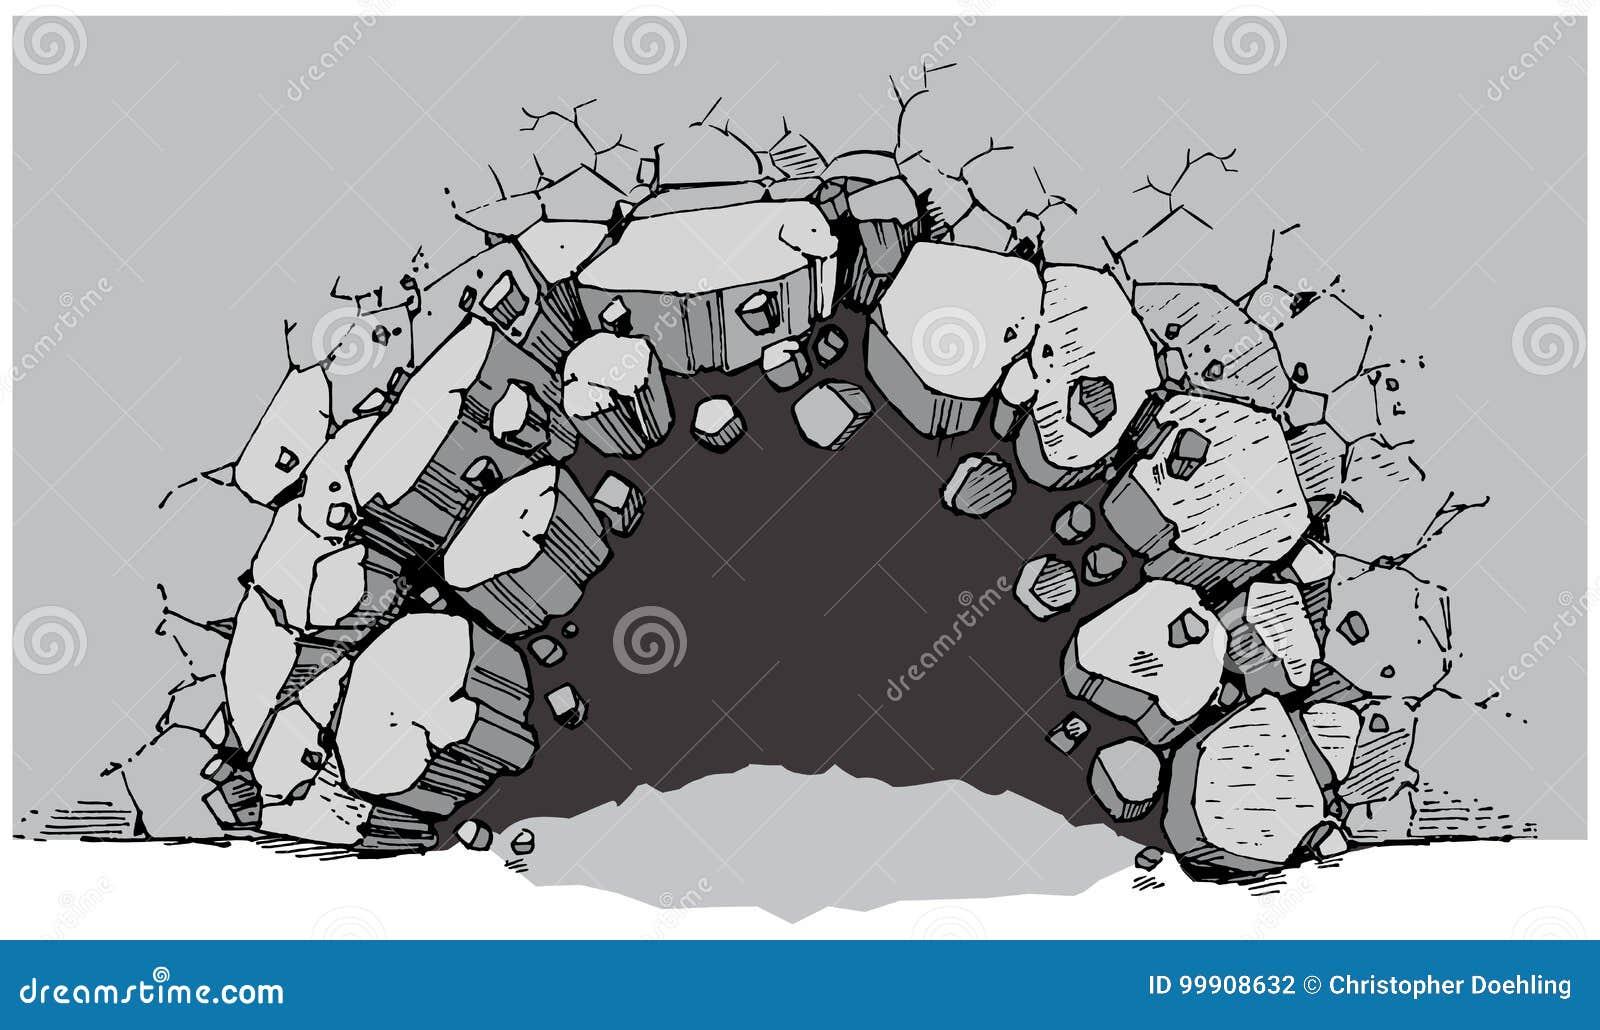 how to break up old interlock brick into rubble